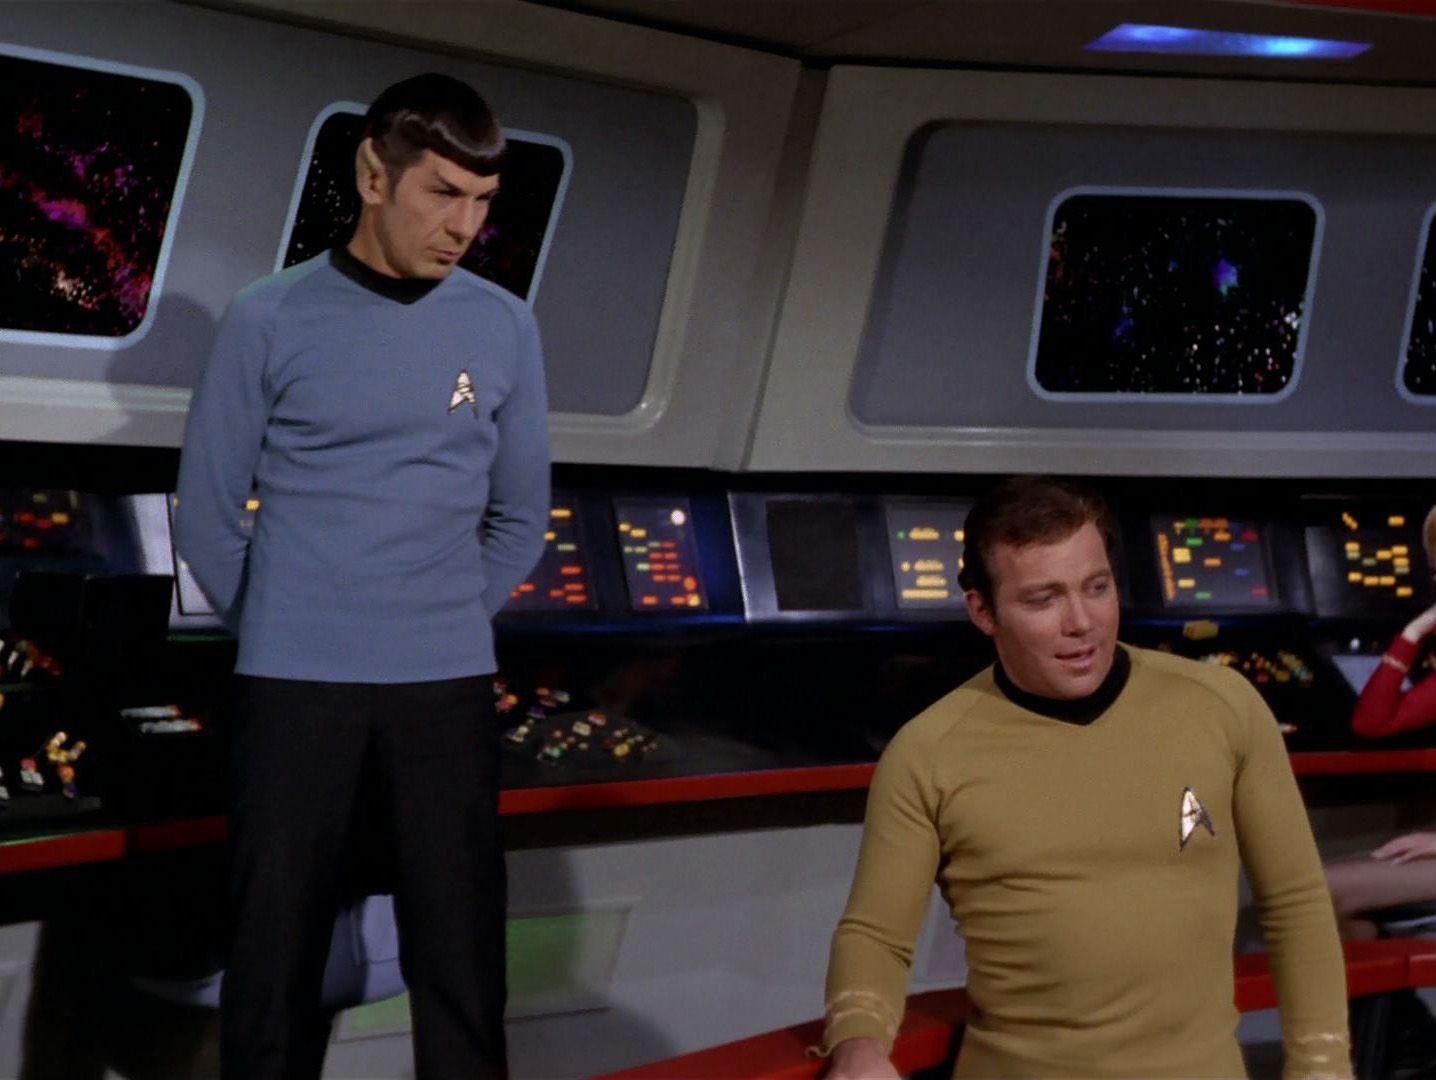 Mr. Spock (Leonard Nimoy) & Captain Kirk (William Shatner) - Star Trek: The Original Series S03E20: The Way to Eden (First Broadcast: February 21, 1969)